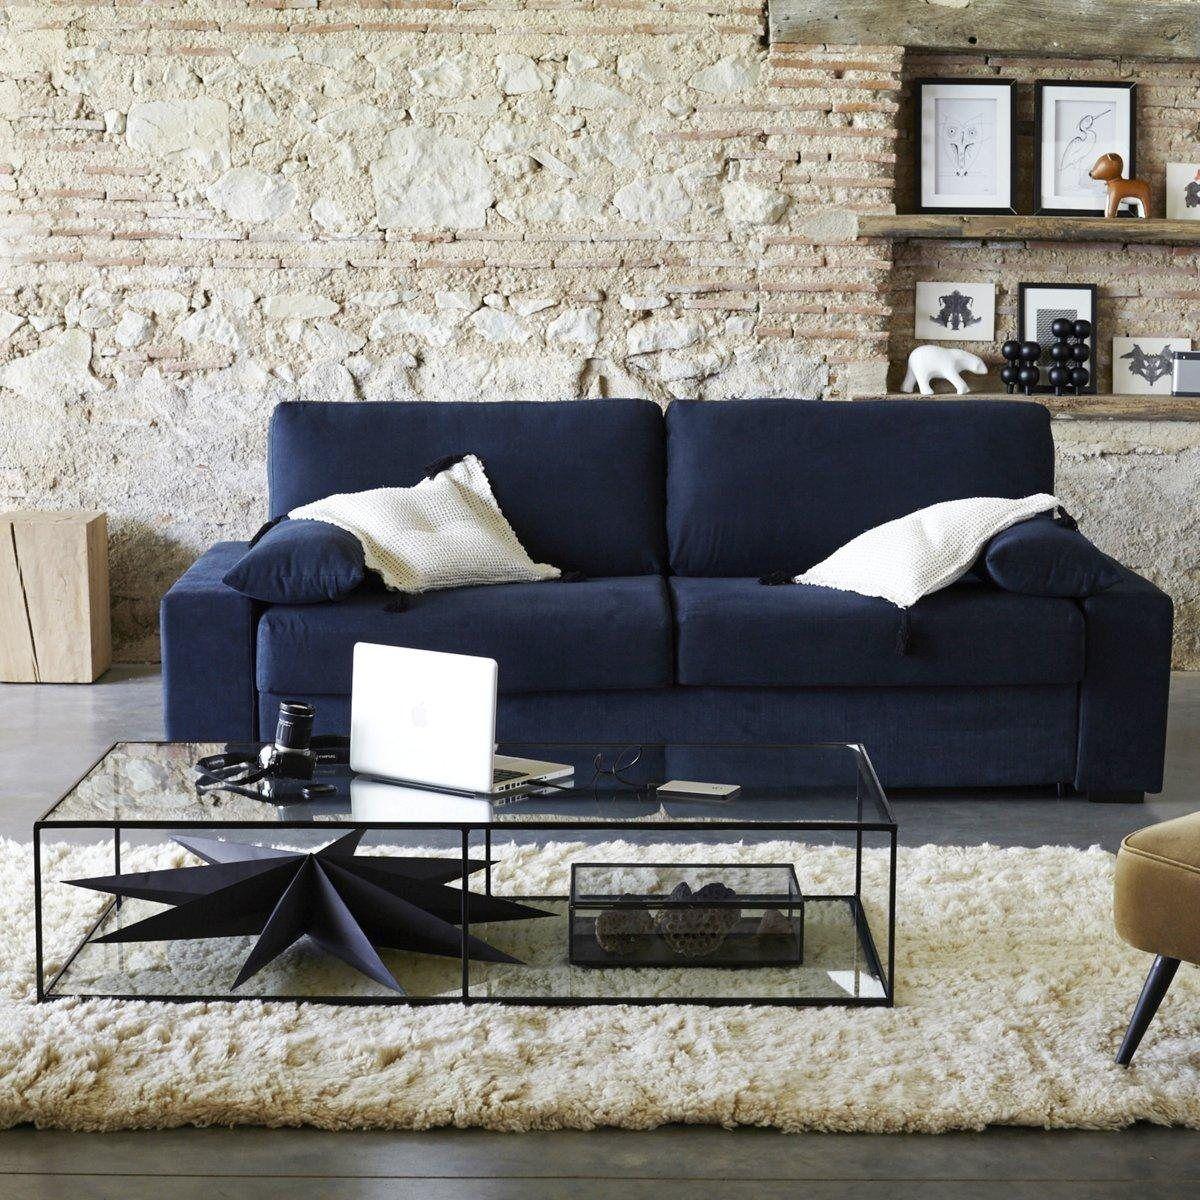 tapis style berb re en laine shadi d co appartement. Black Bedroom Furniture Sets. Home Design Ideas